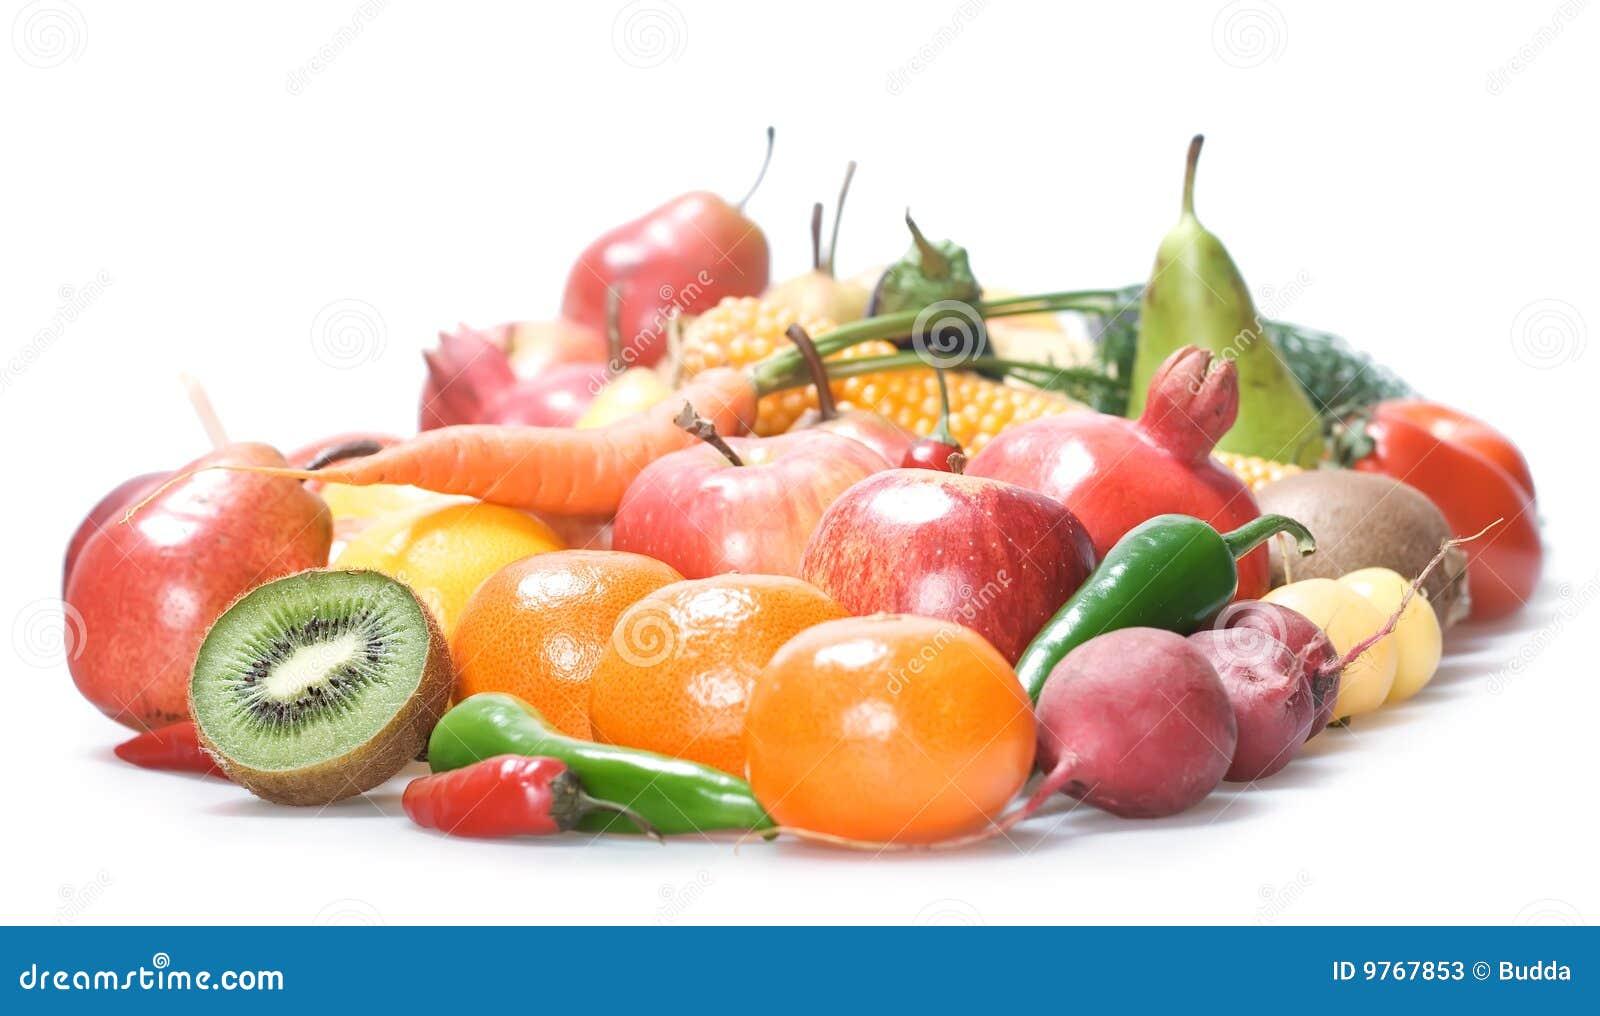 Sky vegetables business plan - Preparing a Food Processing